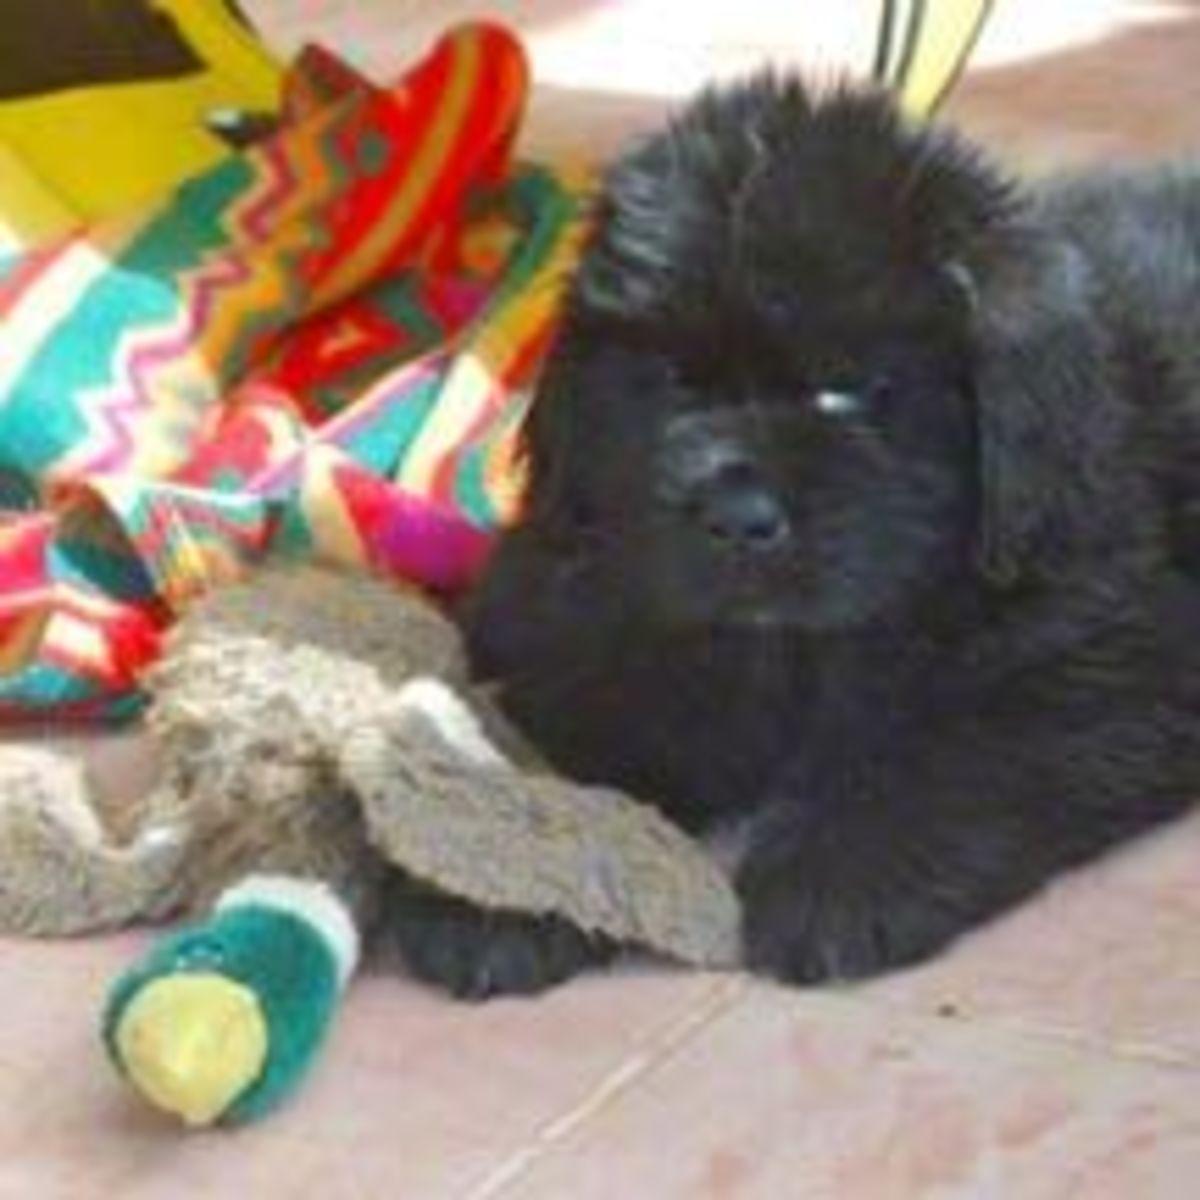 7 Week Old Newfoundland Puppy